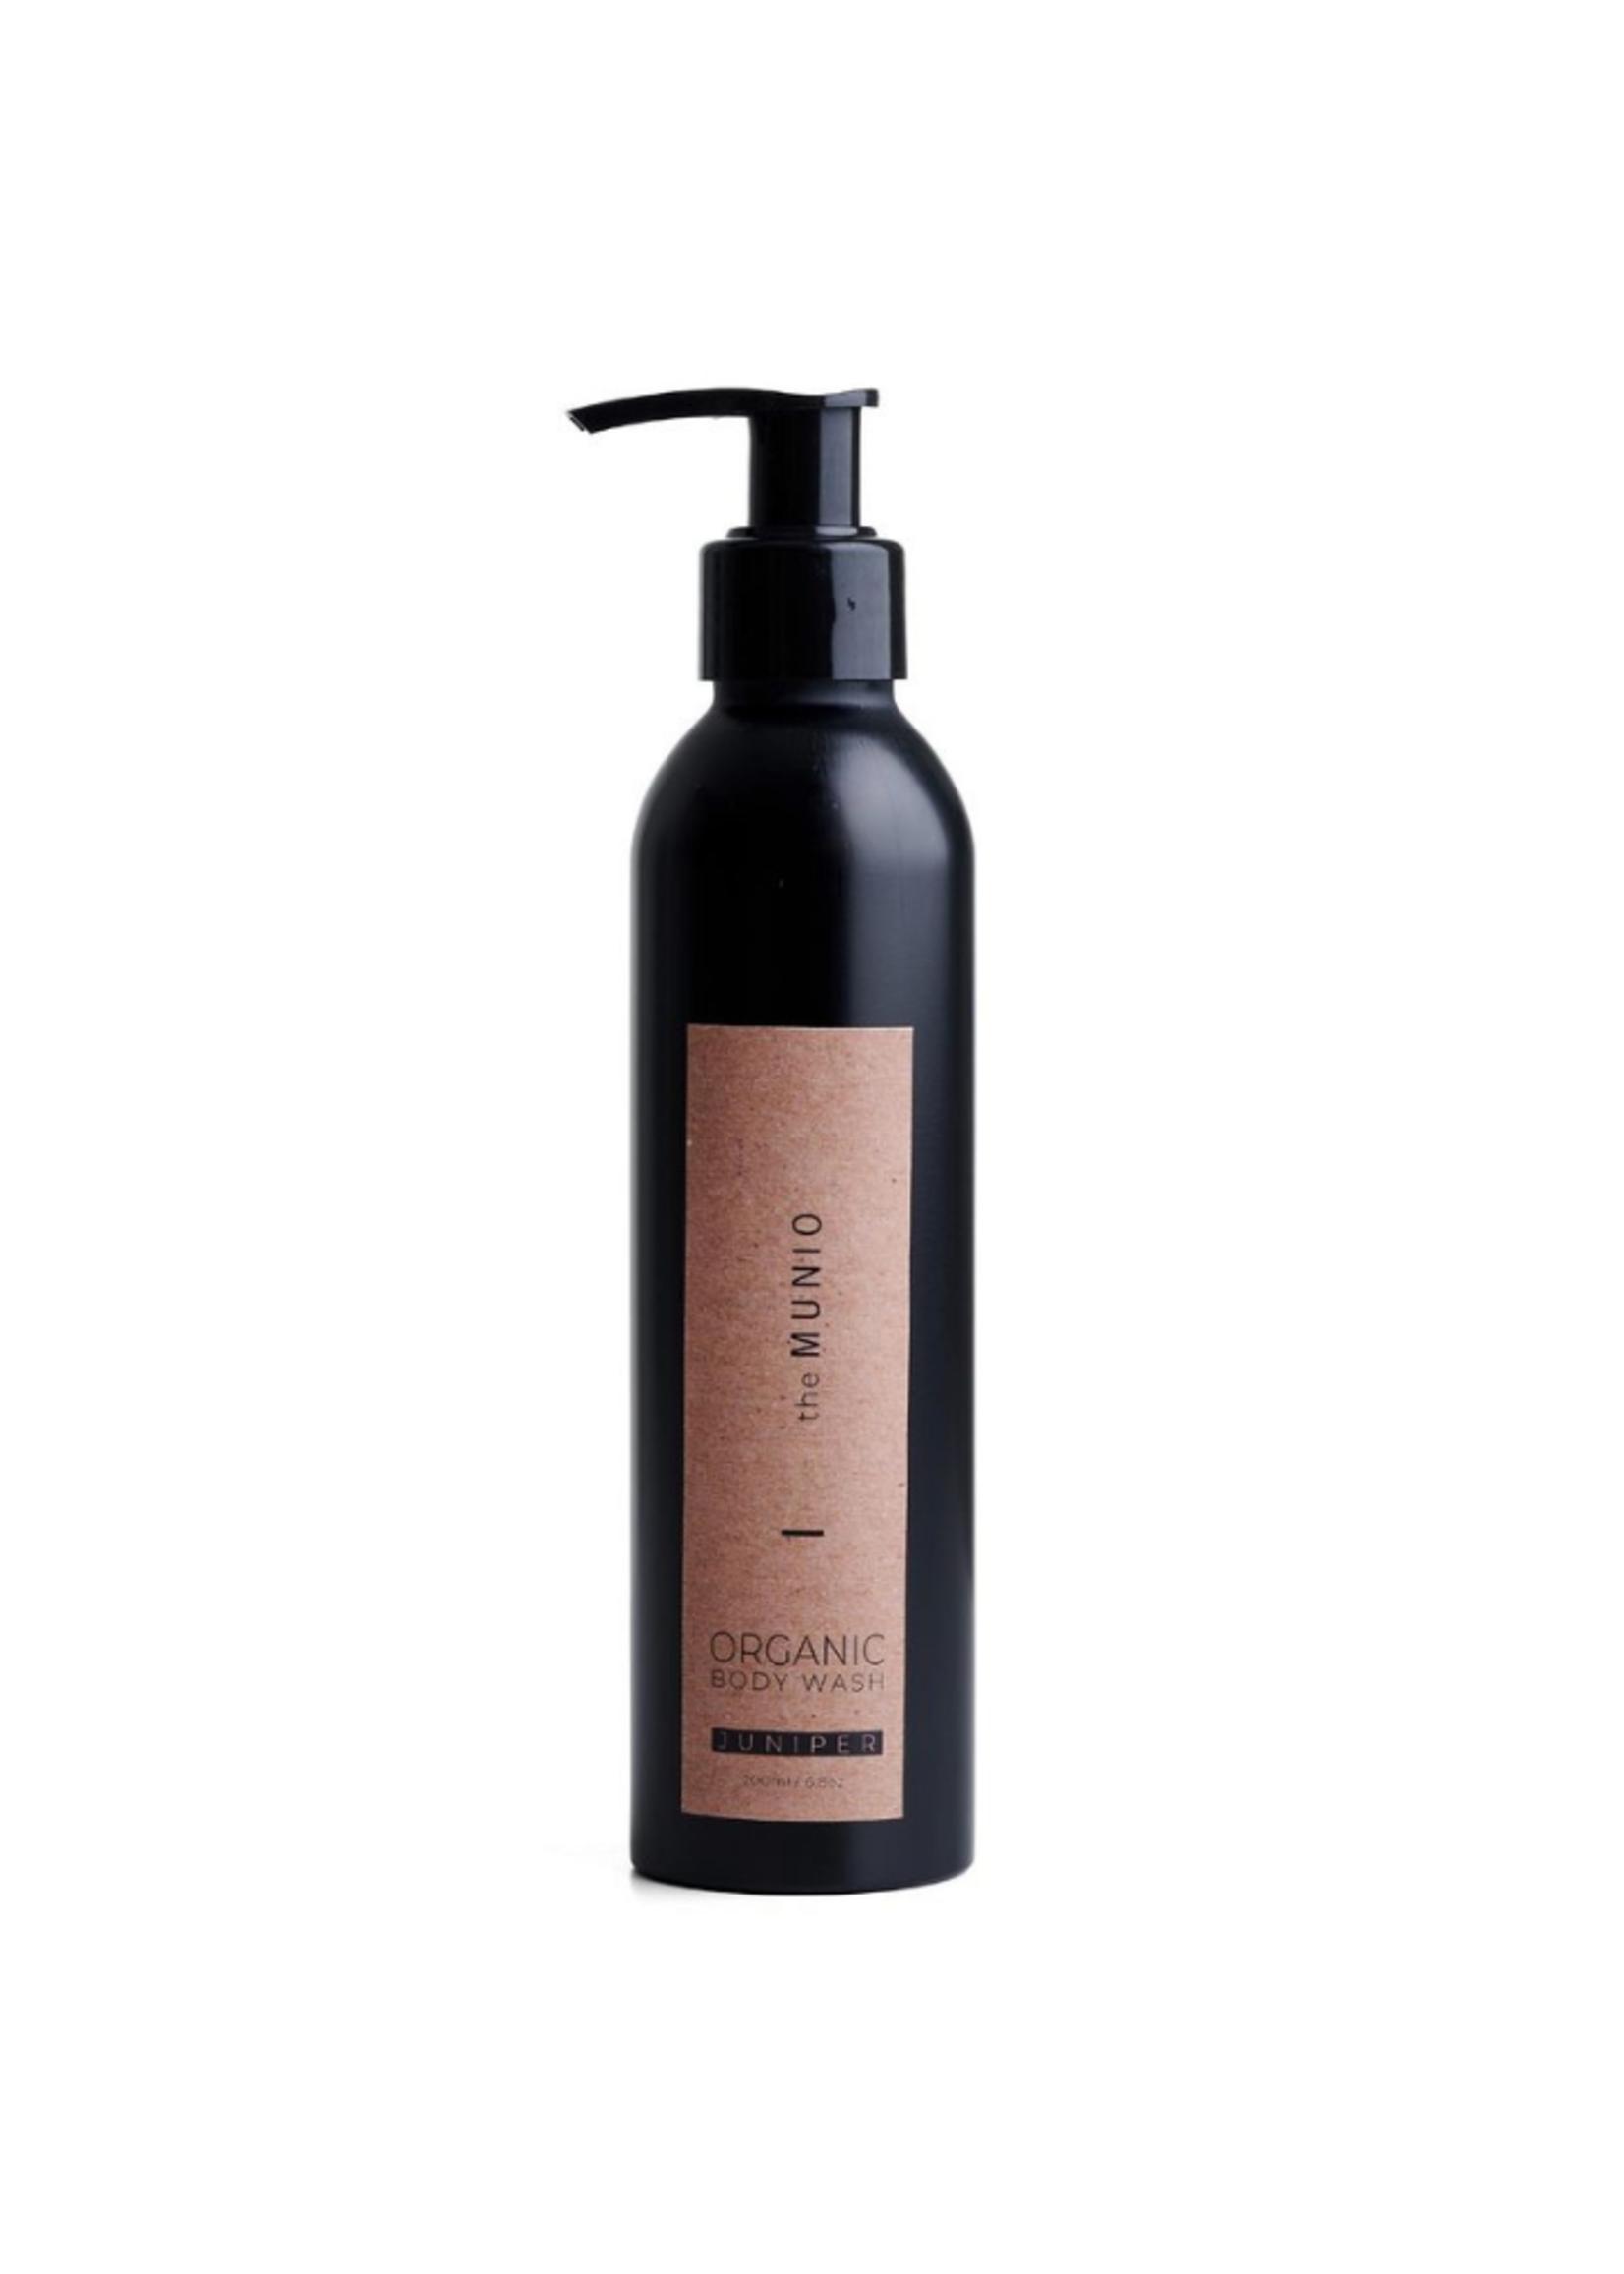 The Munio Juniper Organic Body Wash